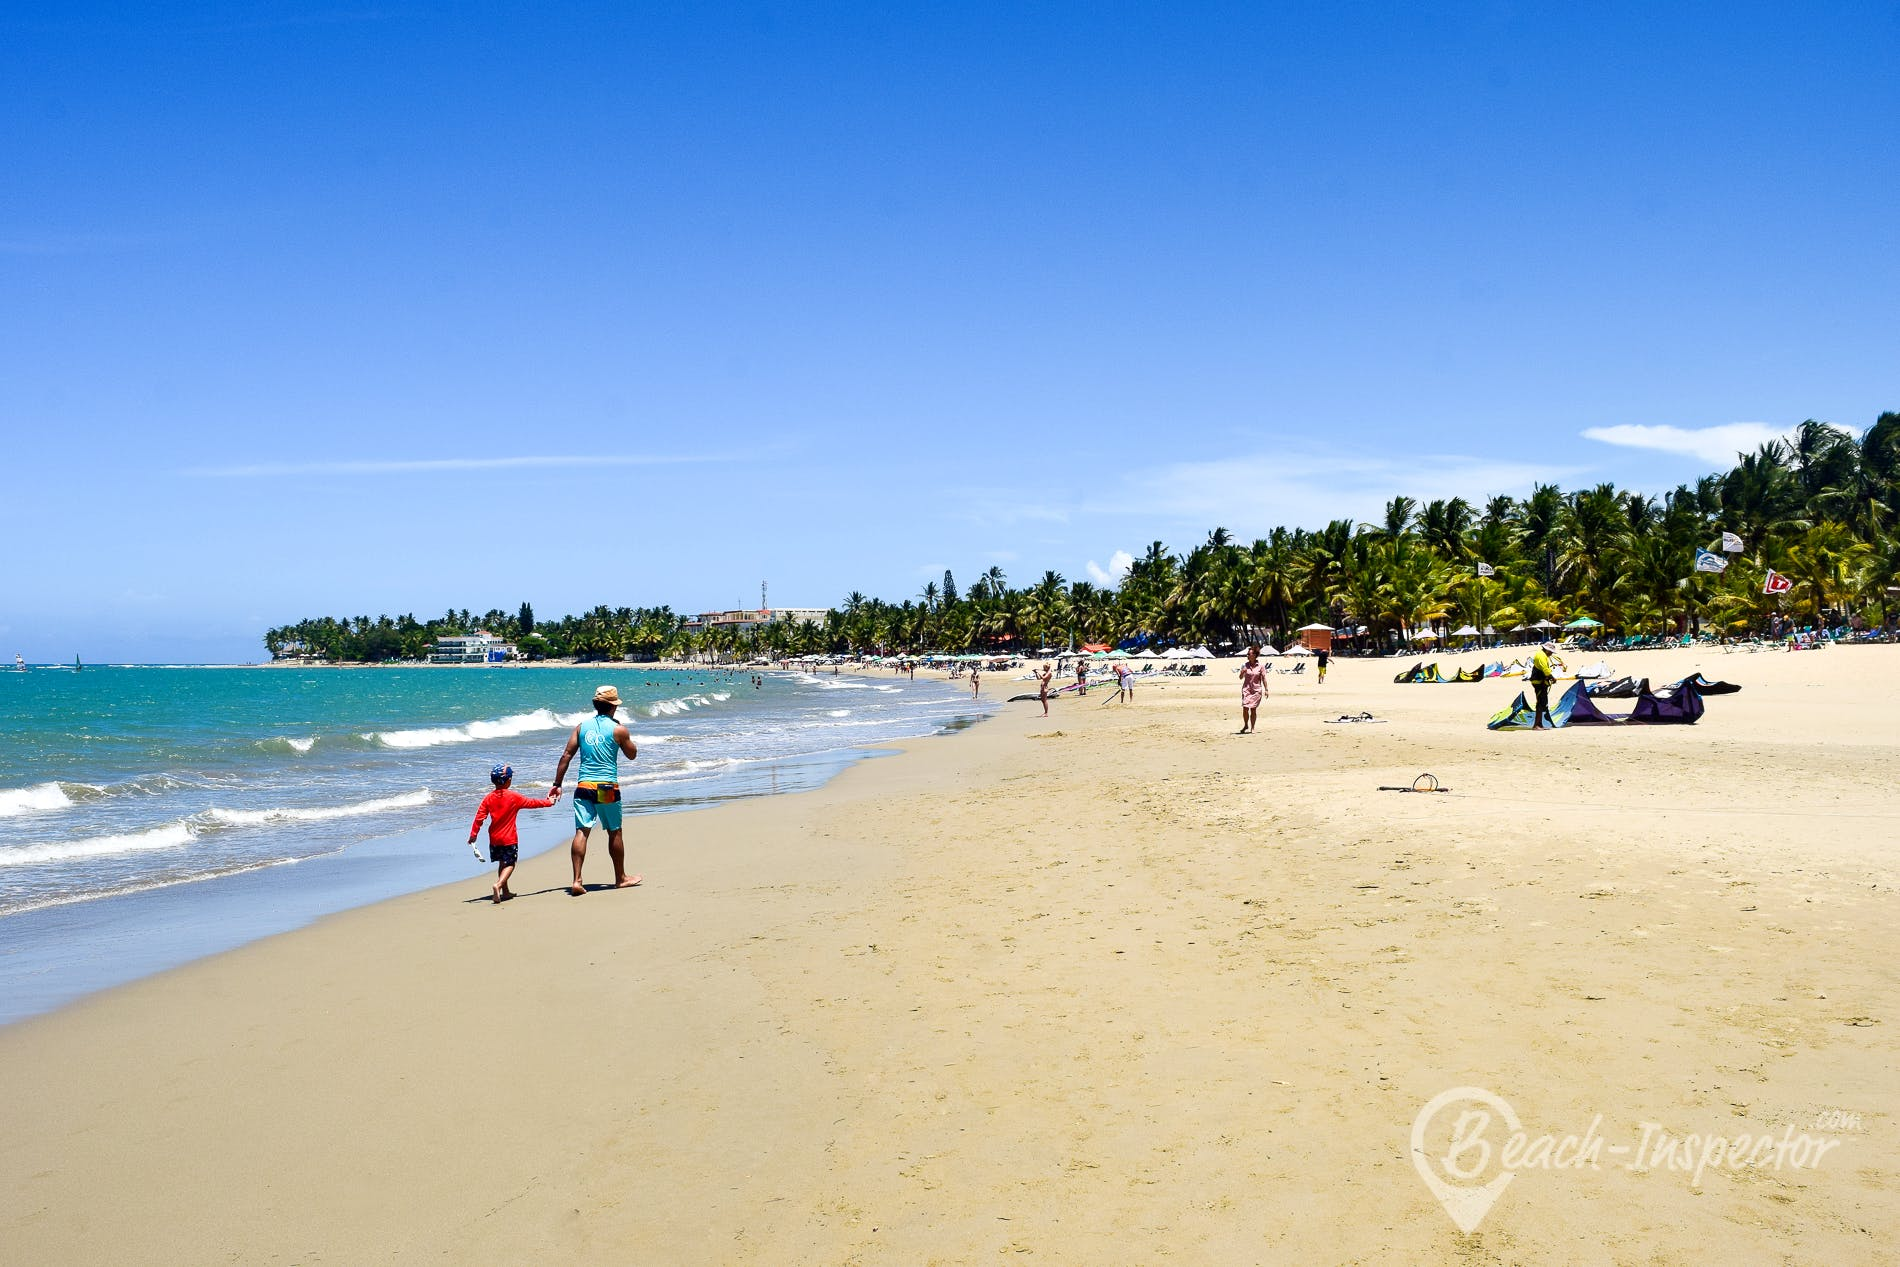 Beach Playa Cabarete, Dominican Republic, Dominican Republic